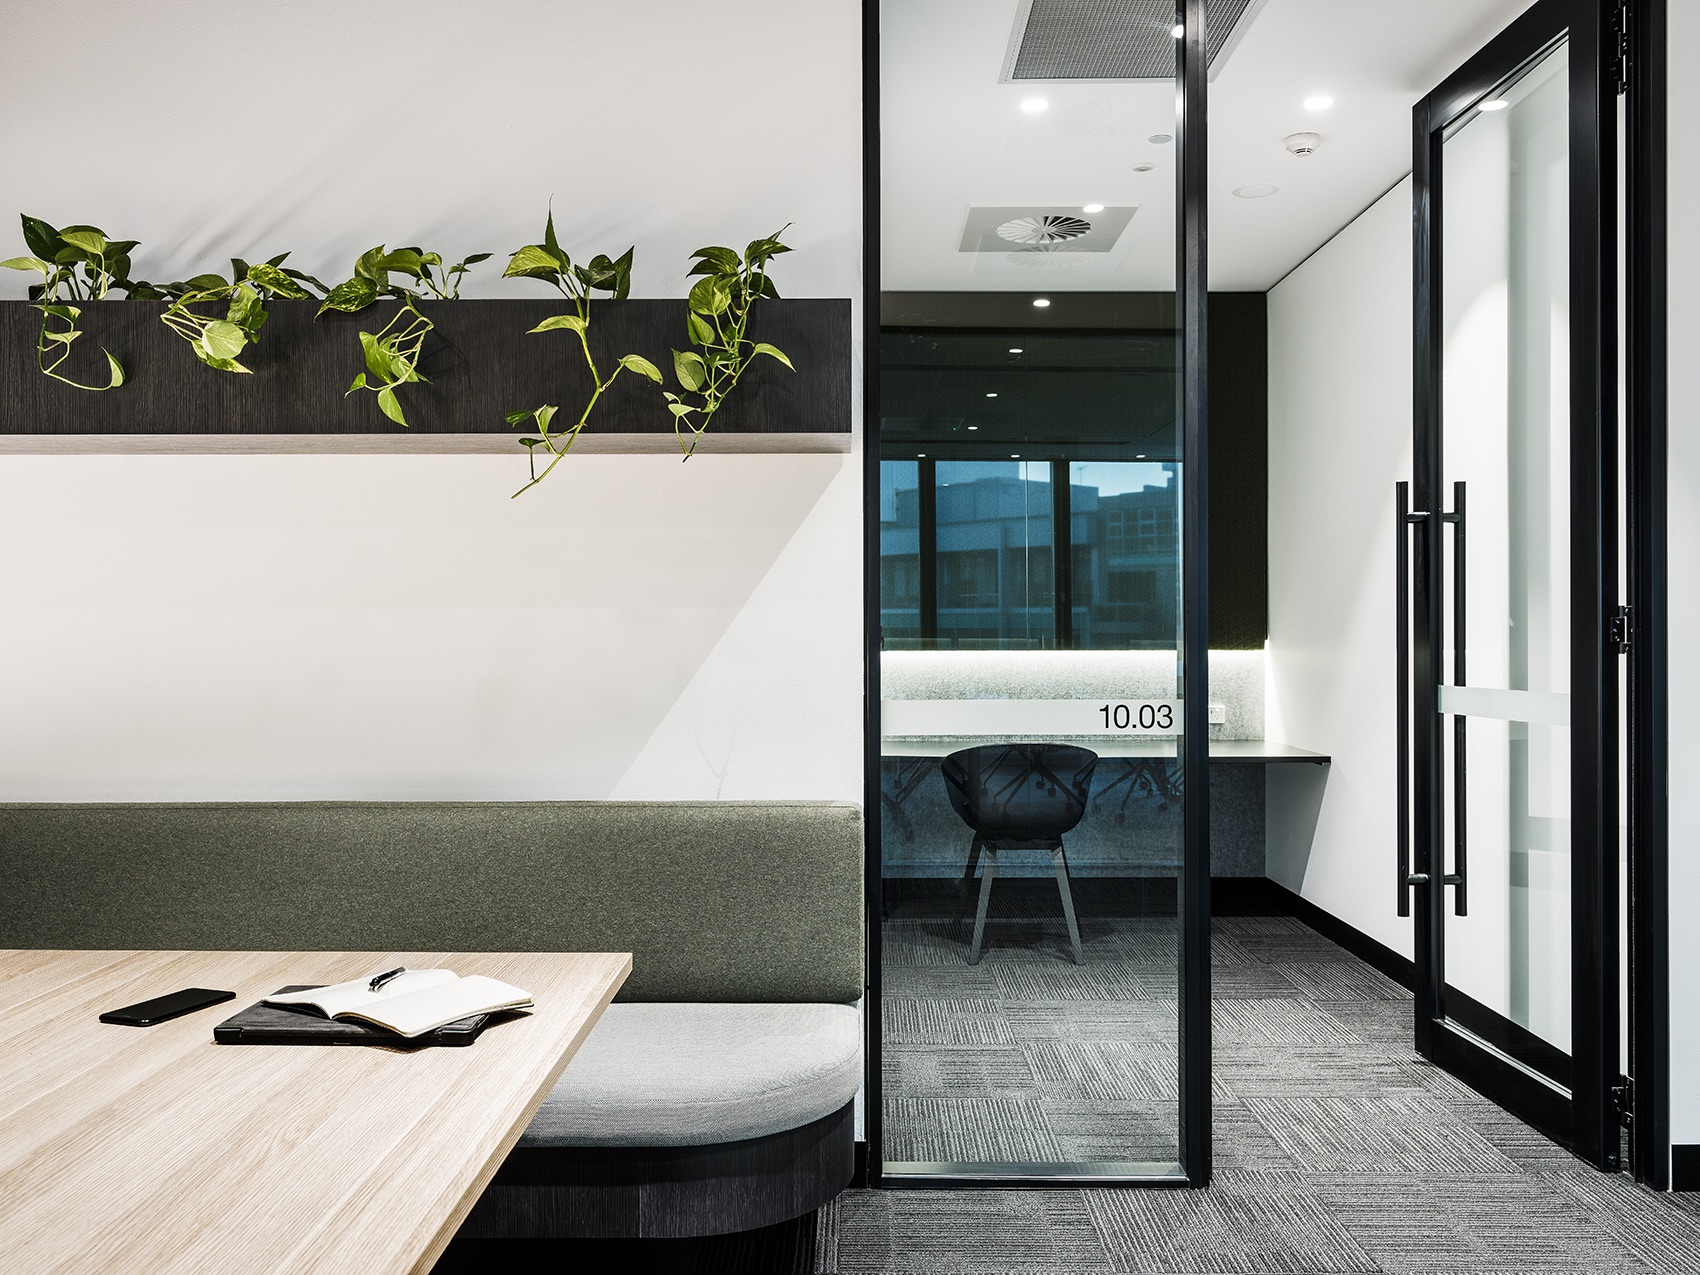 broadspectrum-office-8